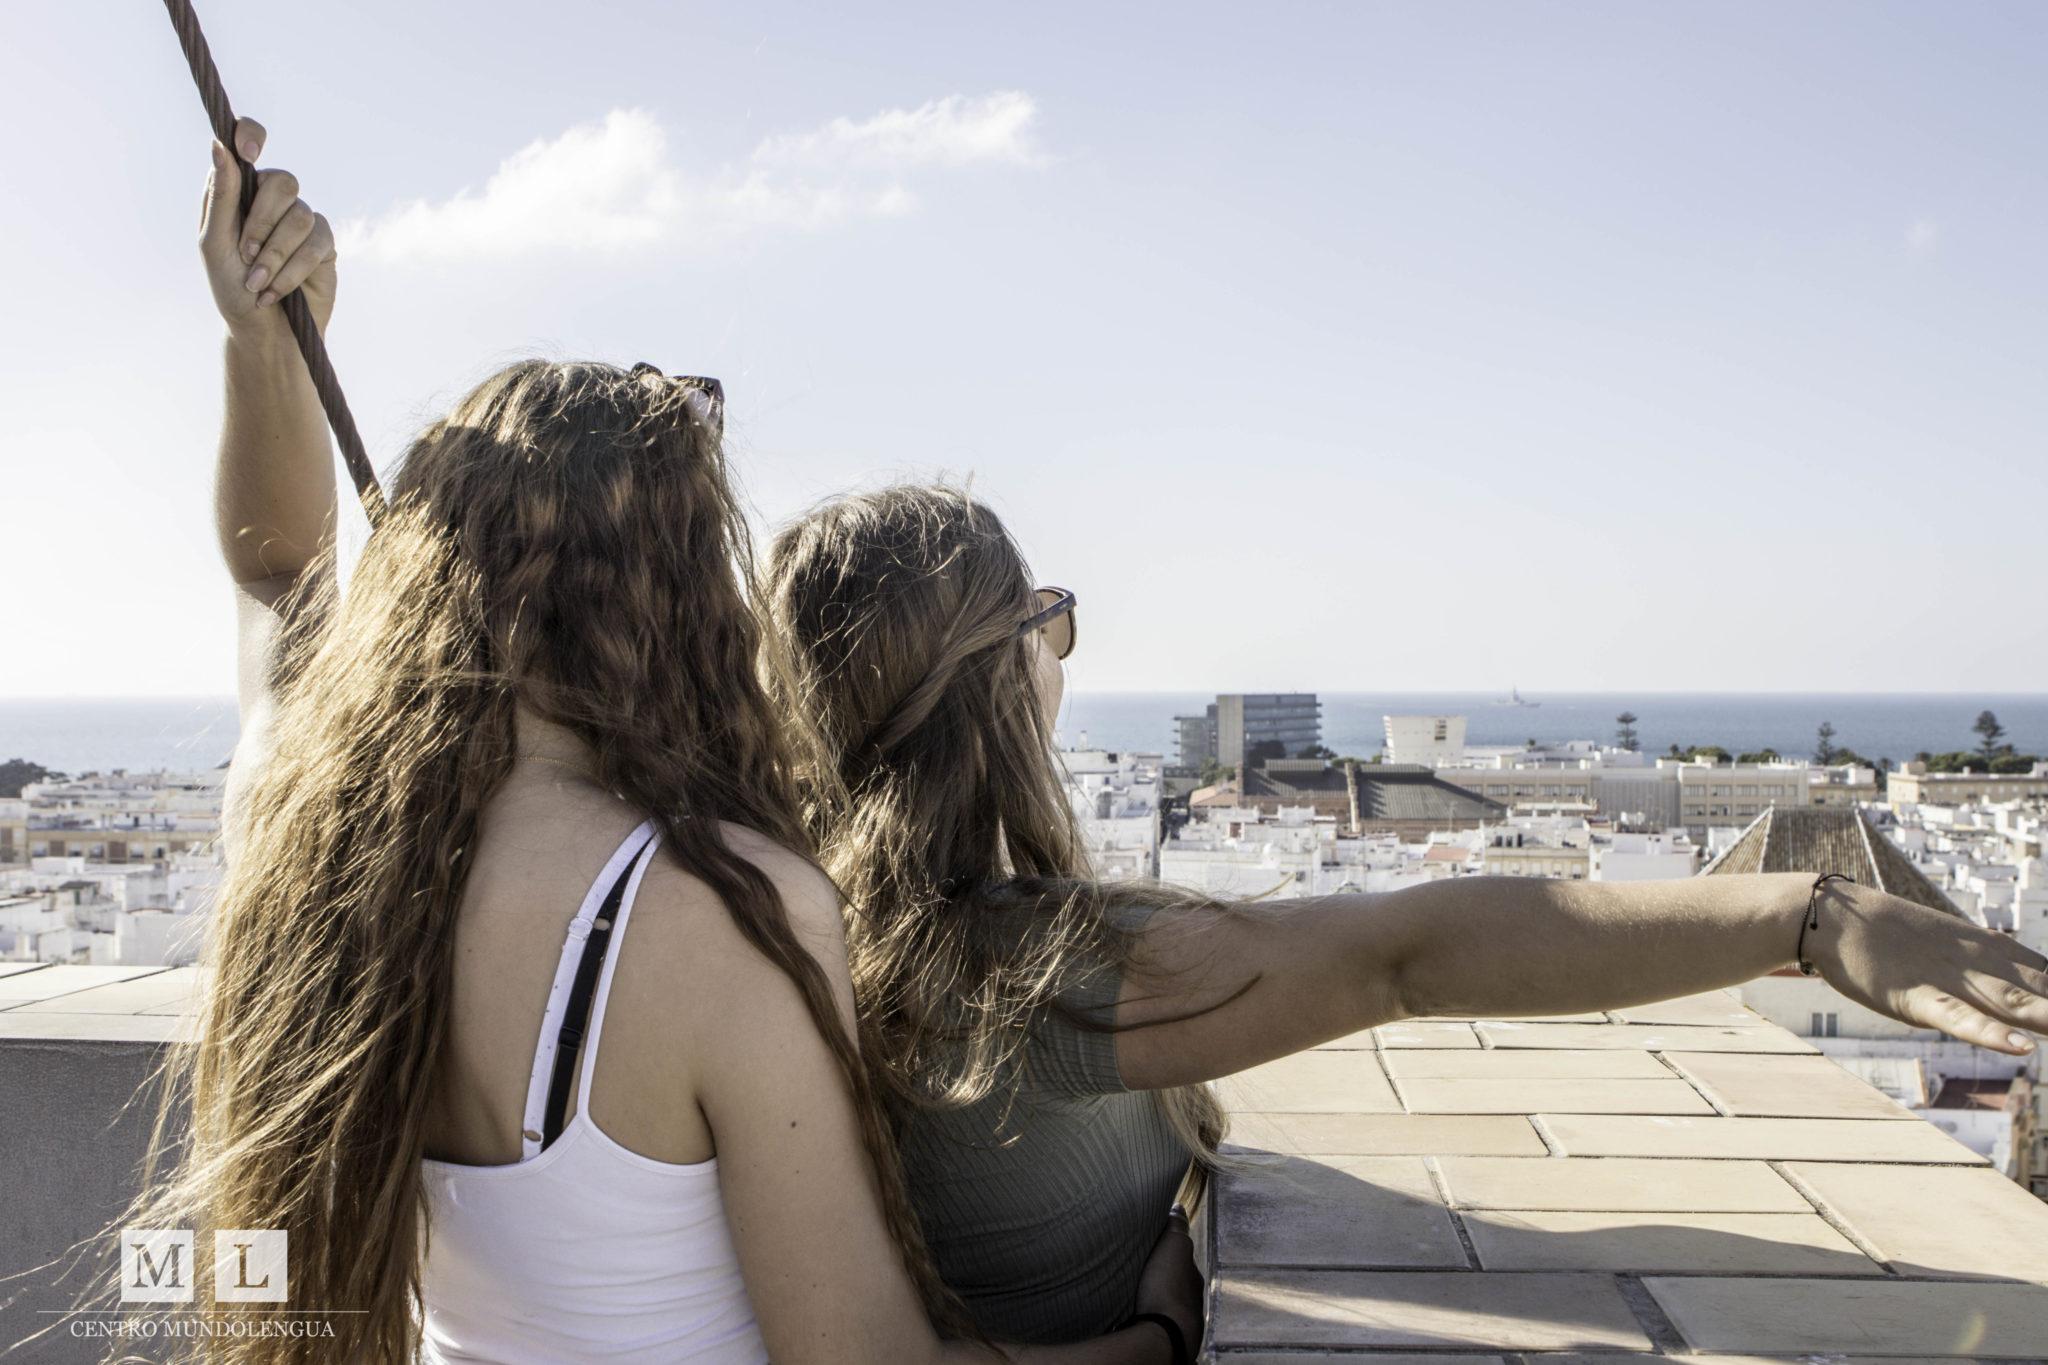 Students doing the 'Titanic' in Cadiz